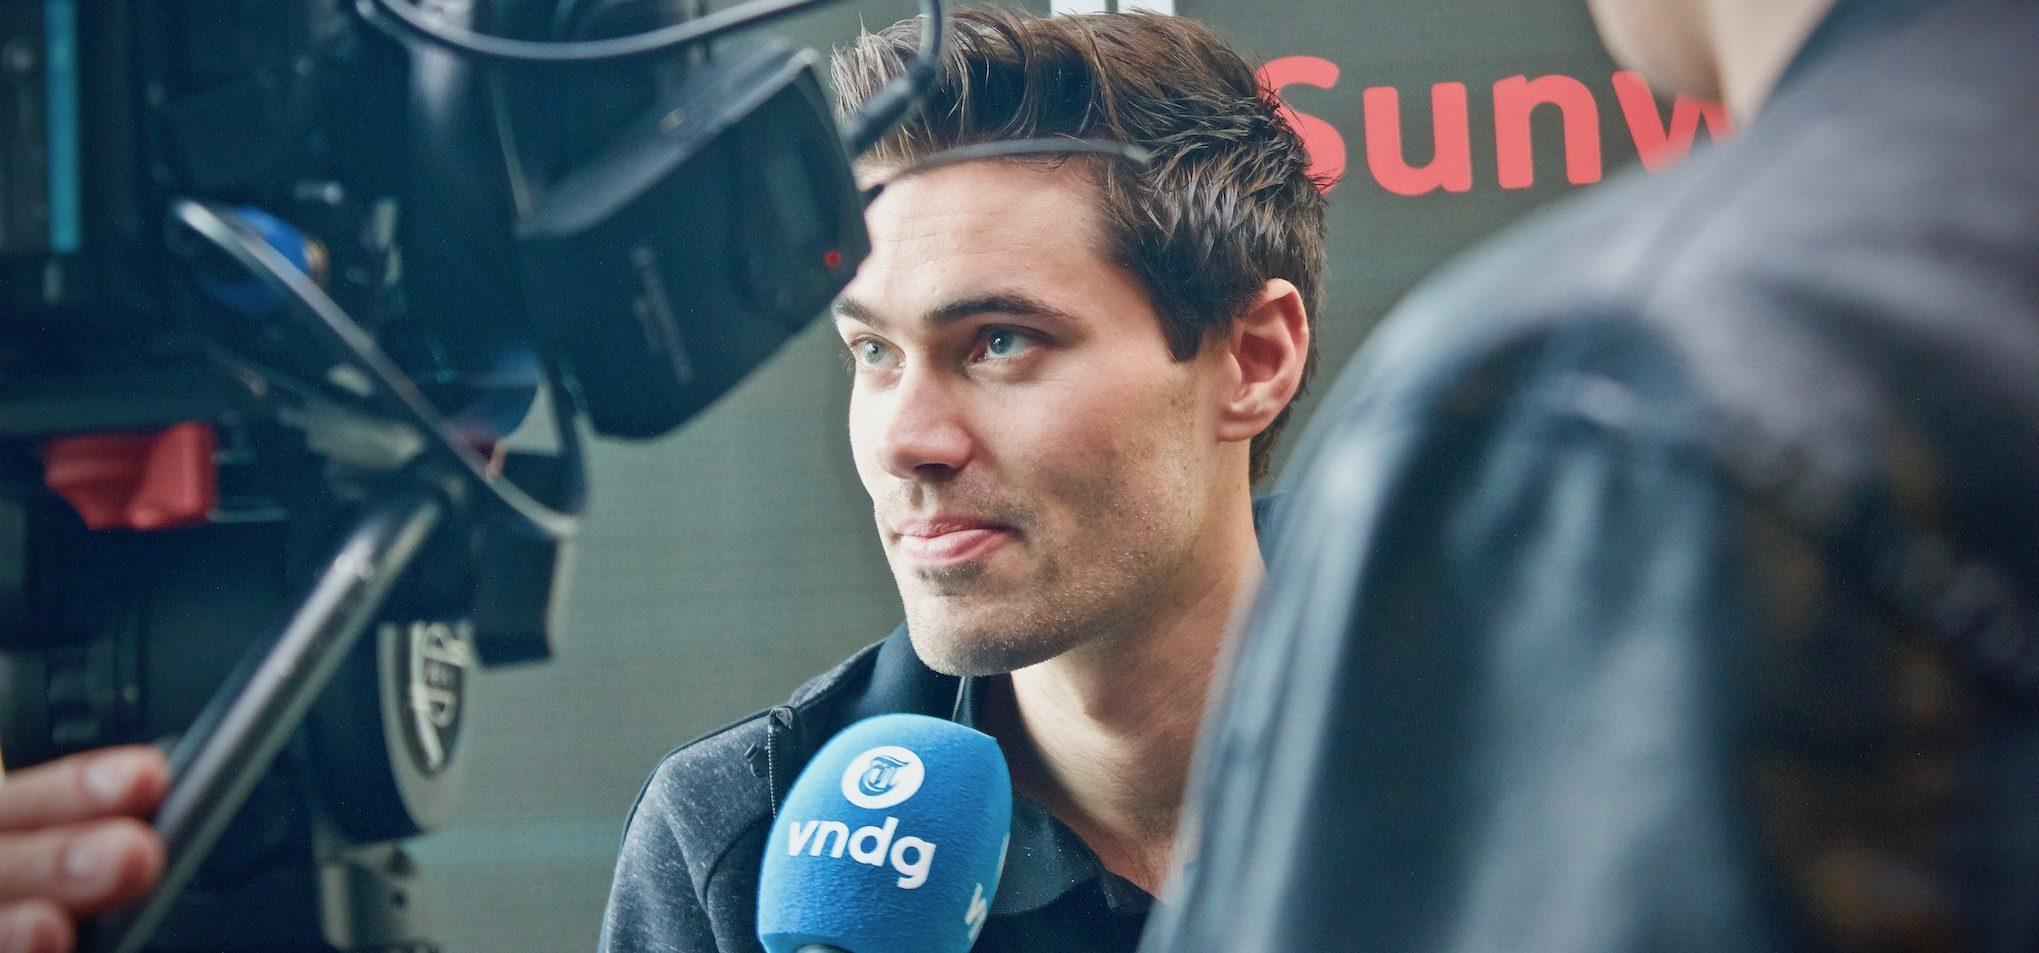 Tom Dumoulin. © Tim van Hengel/Cycling Story